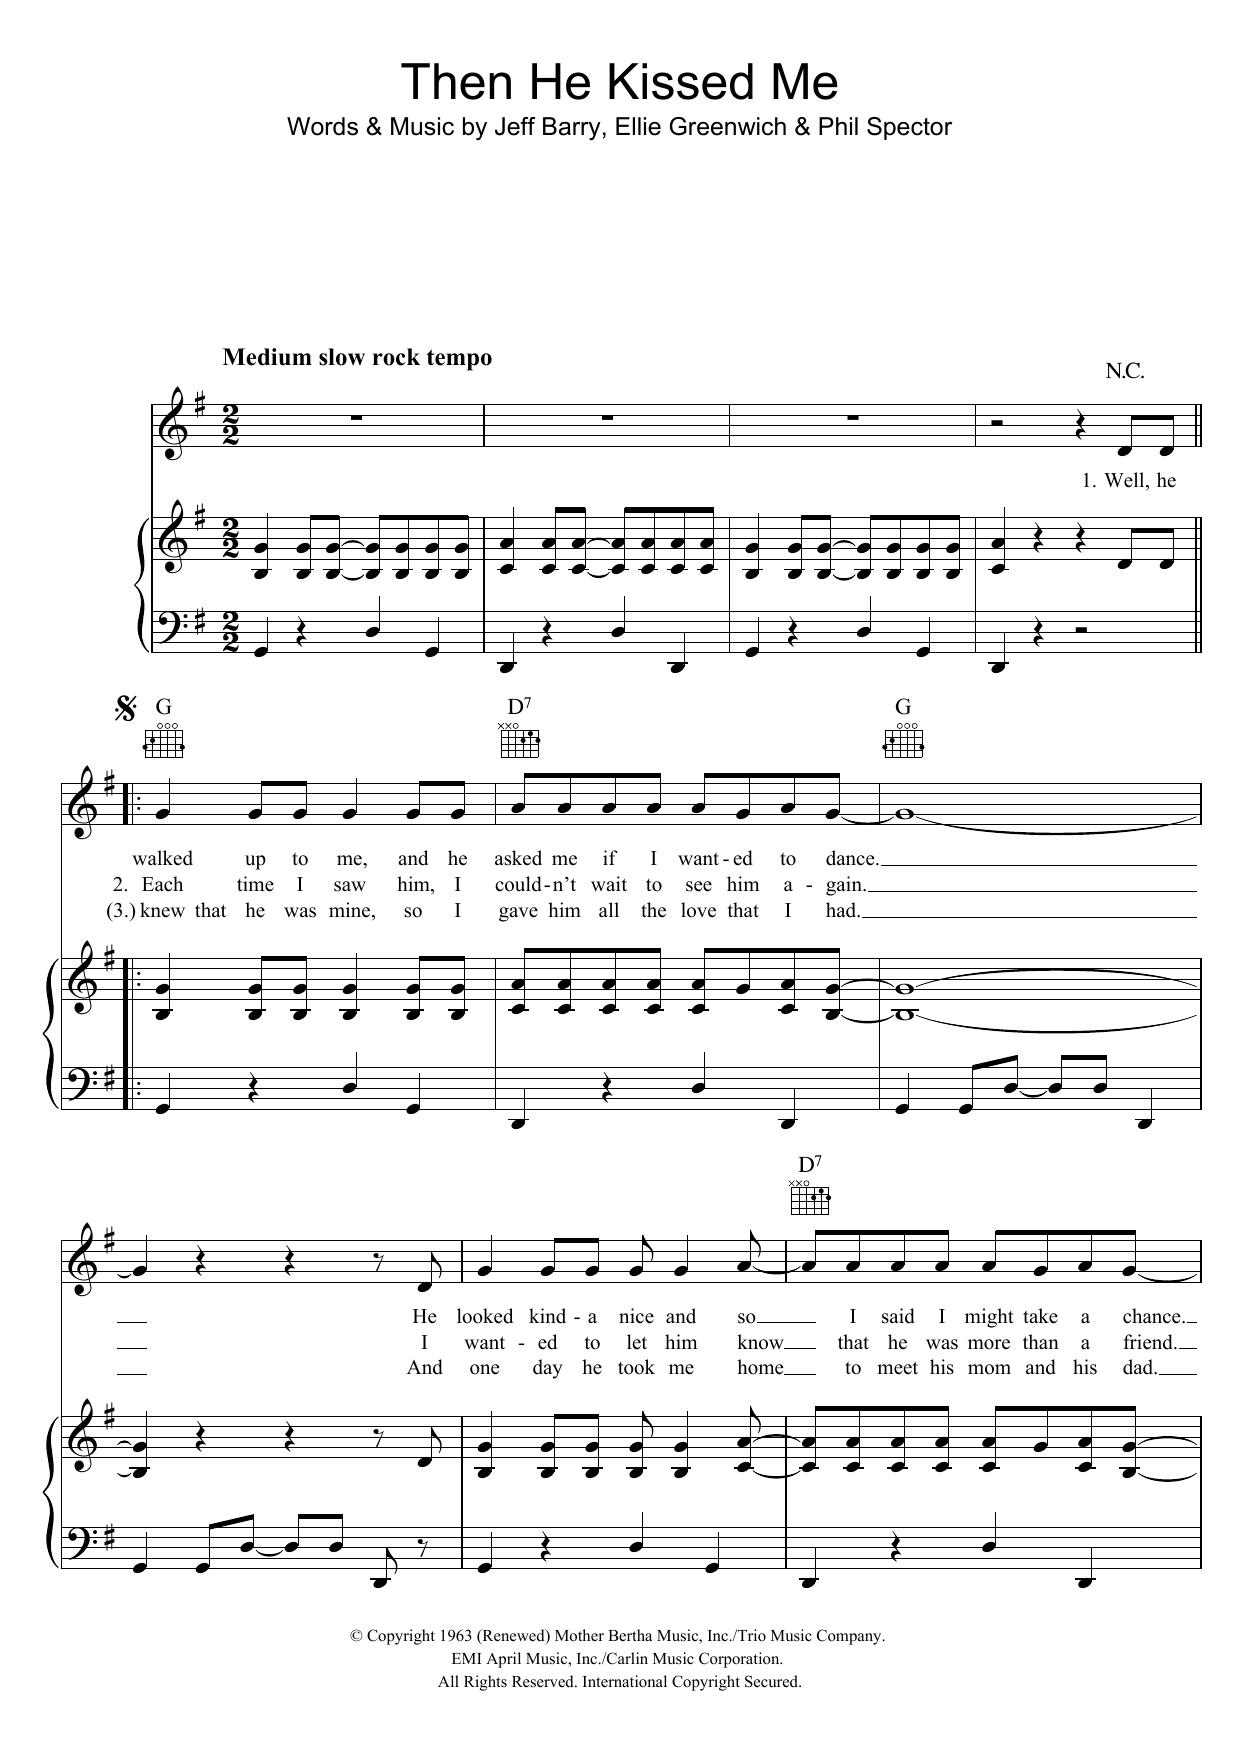 Sheet Music Digital Files To Print